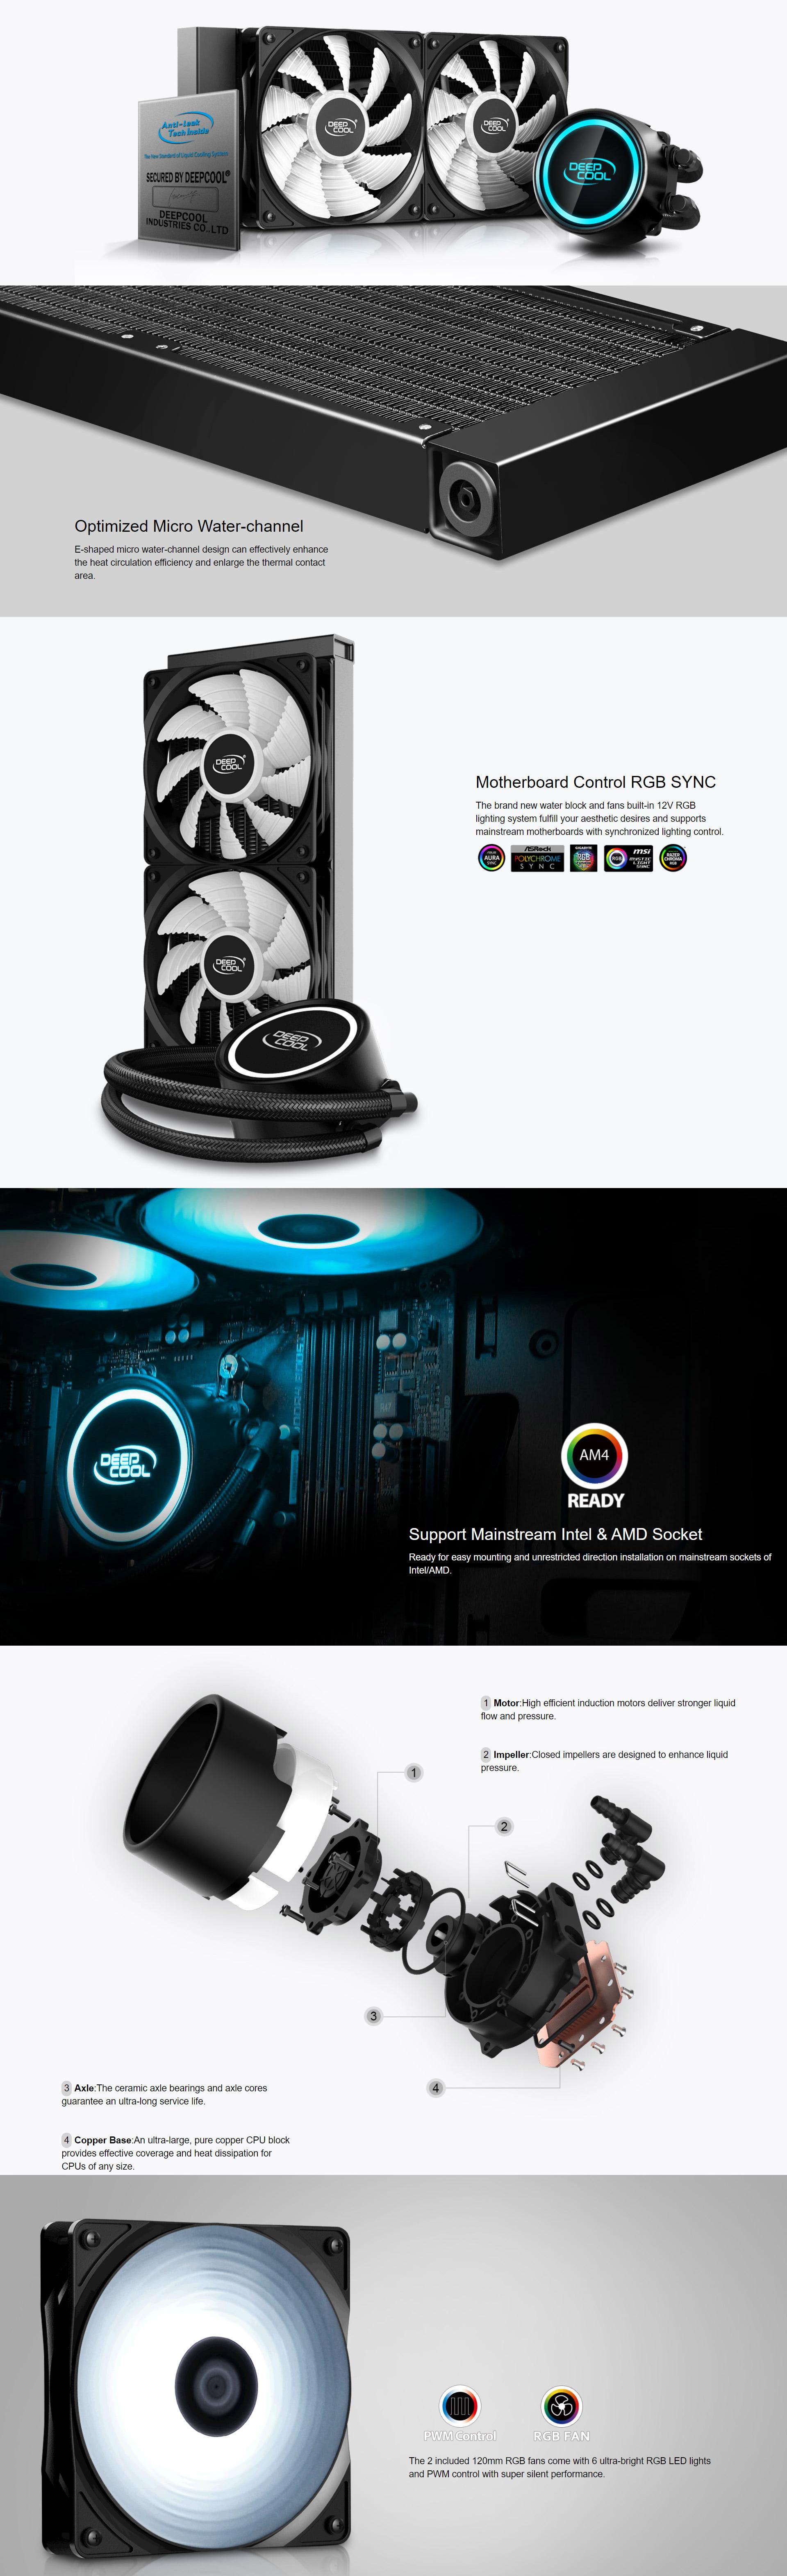 screencapture-deepcool-product-LiquidCooler-2019-04-209-10832-shtml-2020-08-06-19_15_37.jpg